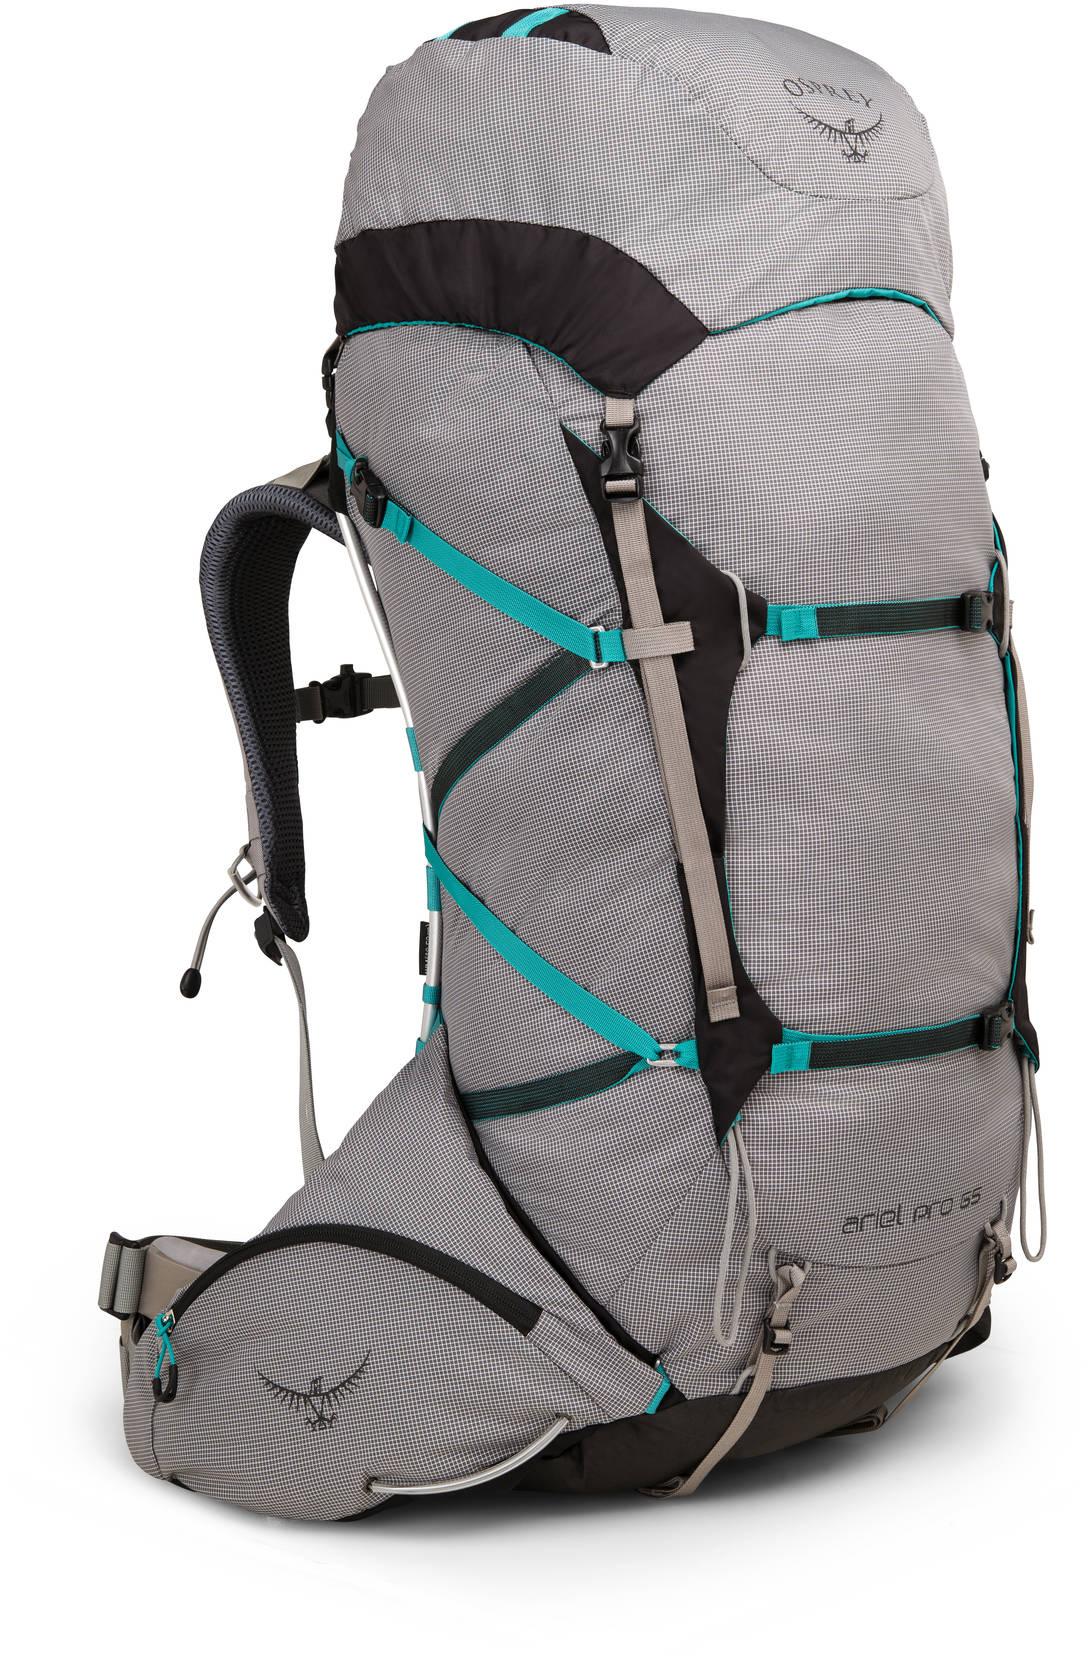 Туристические рюкзаки Рюкзак Osprey Ariel Pro 65 Voyager Grey Ariel_Pro65_S18_Side_Voyager_Grey_web.jpg